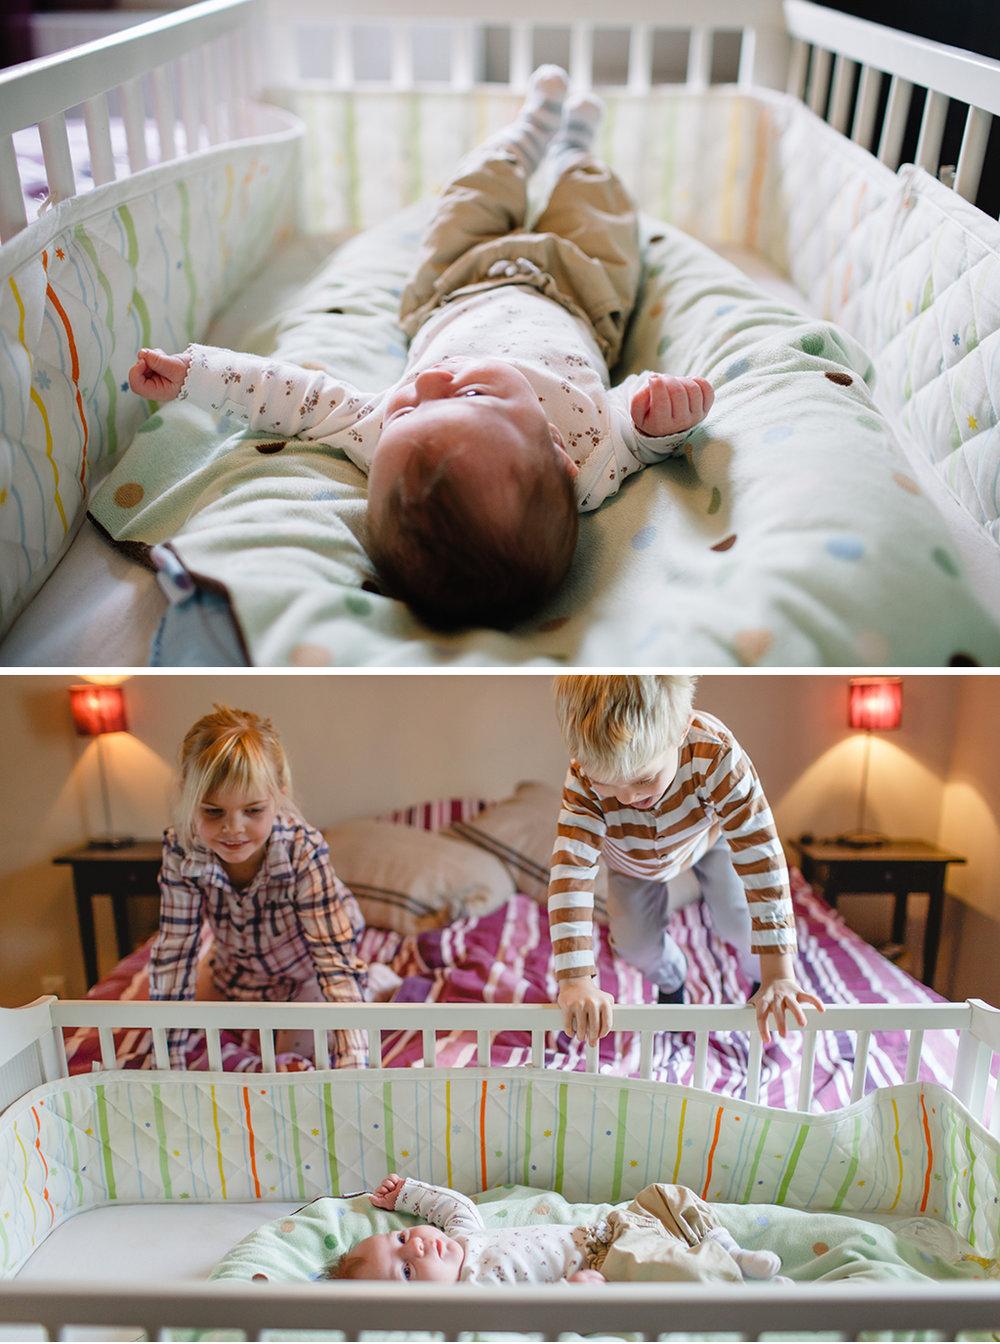 Nyfoddfotografering-lifestyle-familjefotografering-Stockholm-7.jpg